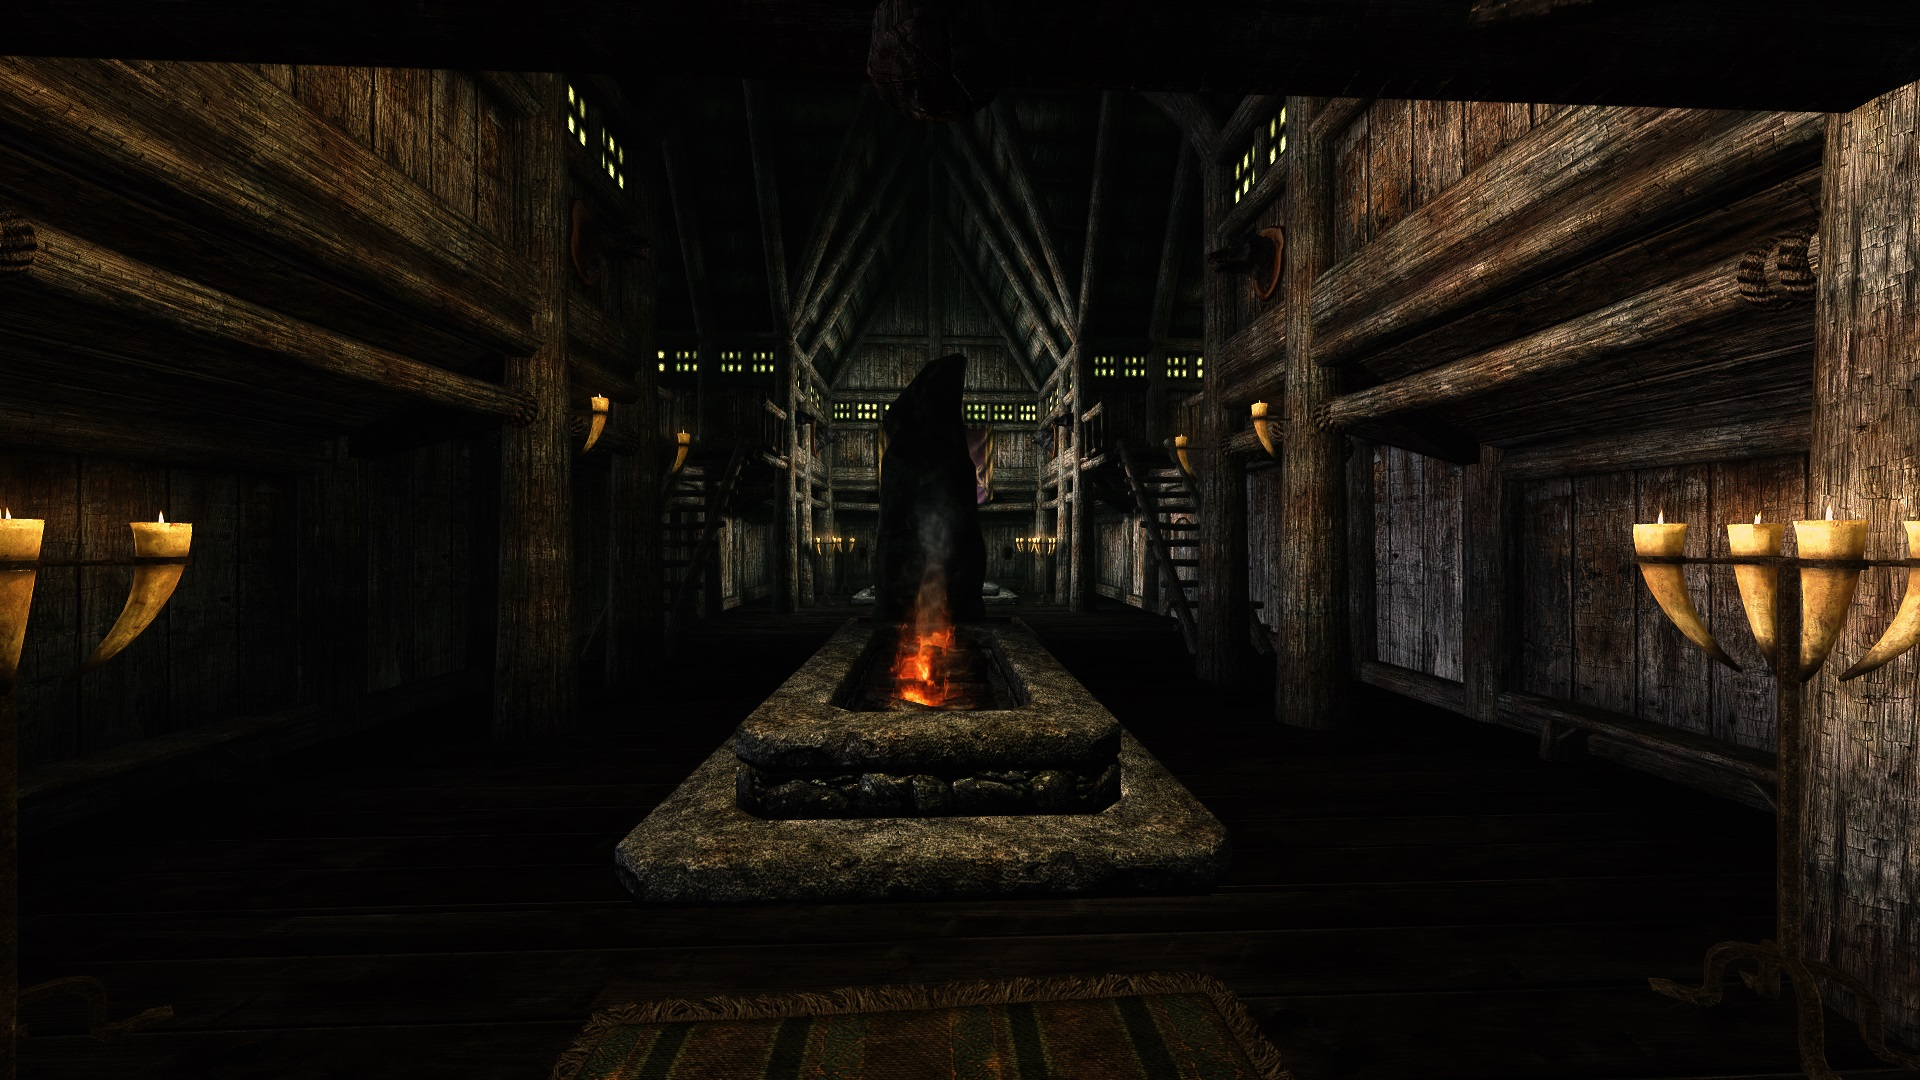 [Post Oficial] The Elder Scrolls V: Skyrim Edición Legendaria  - Página 26 The_elder_scrolls_v-3360640